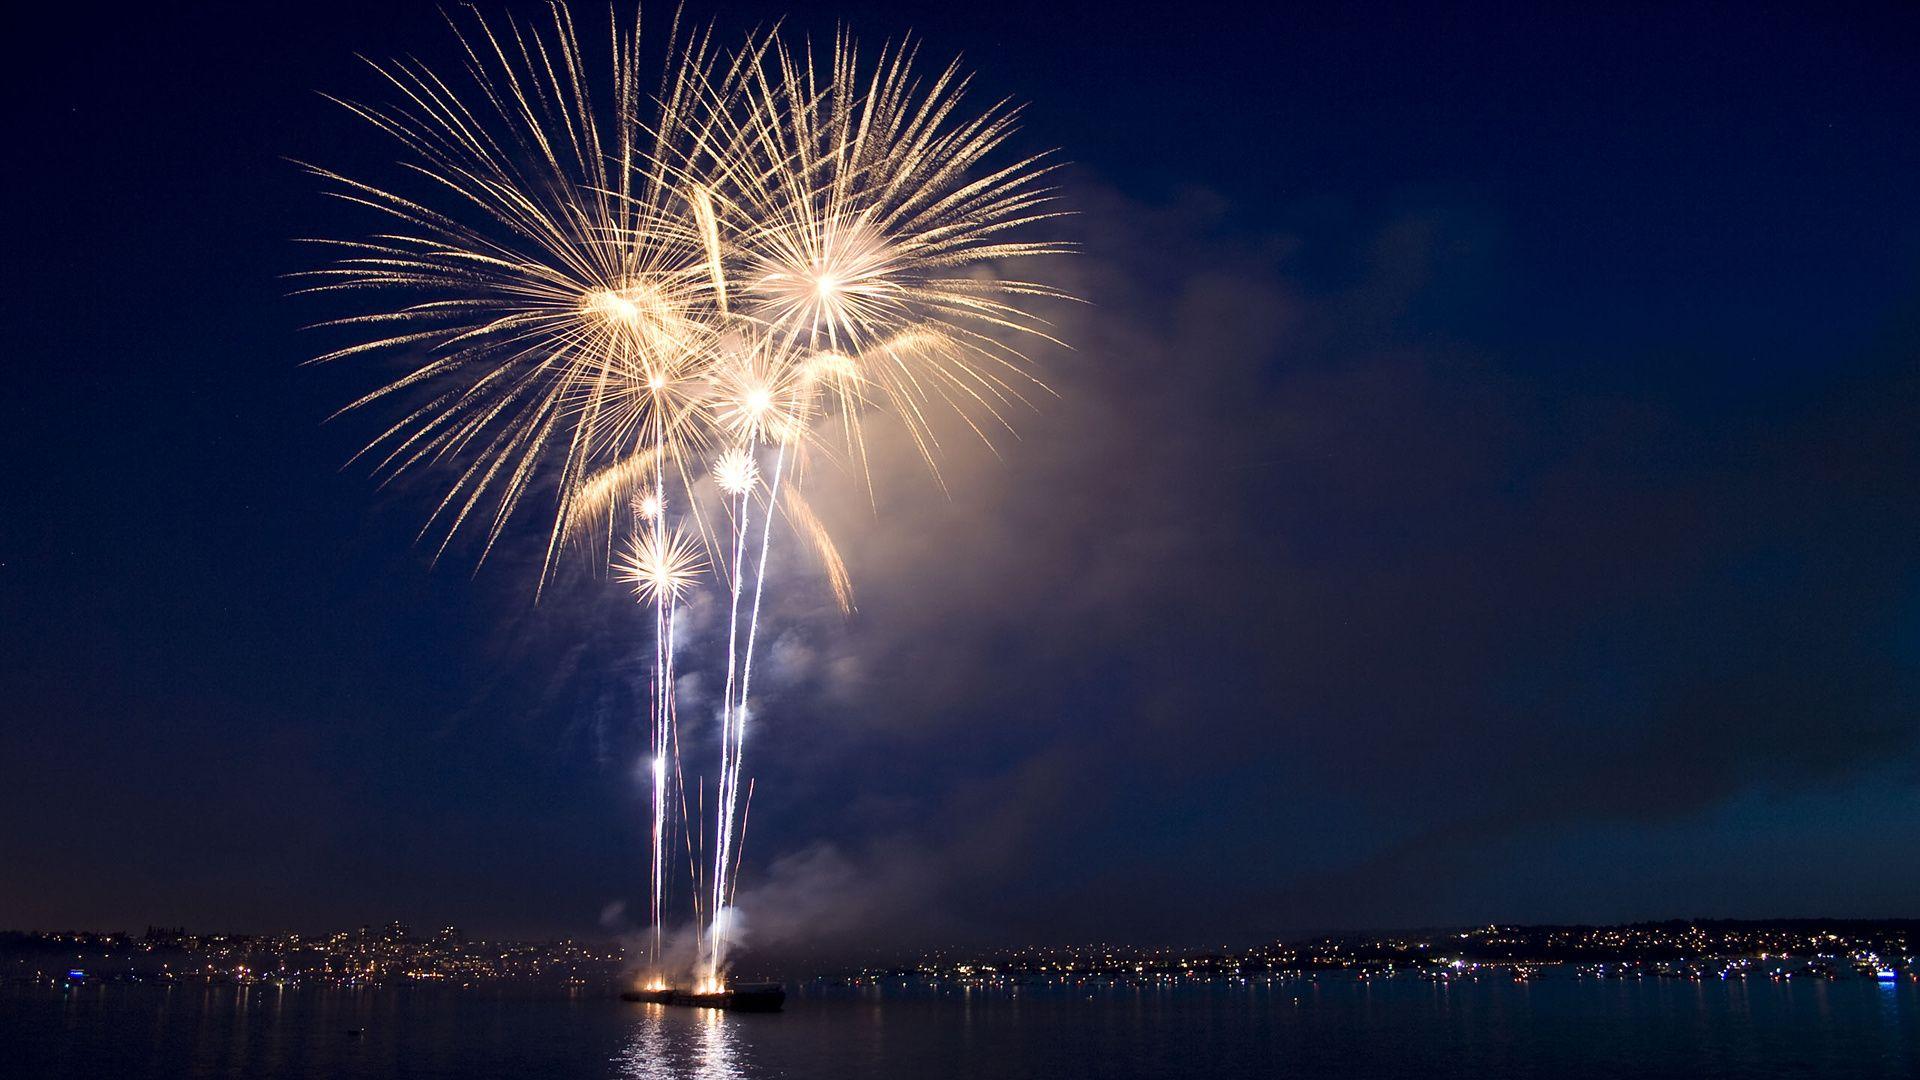 Lighting Fireworks Fireworks Wallpaper Happy New Year Wallpaper New Year Wallpaper